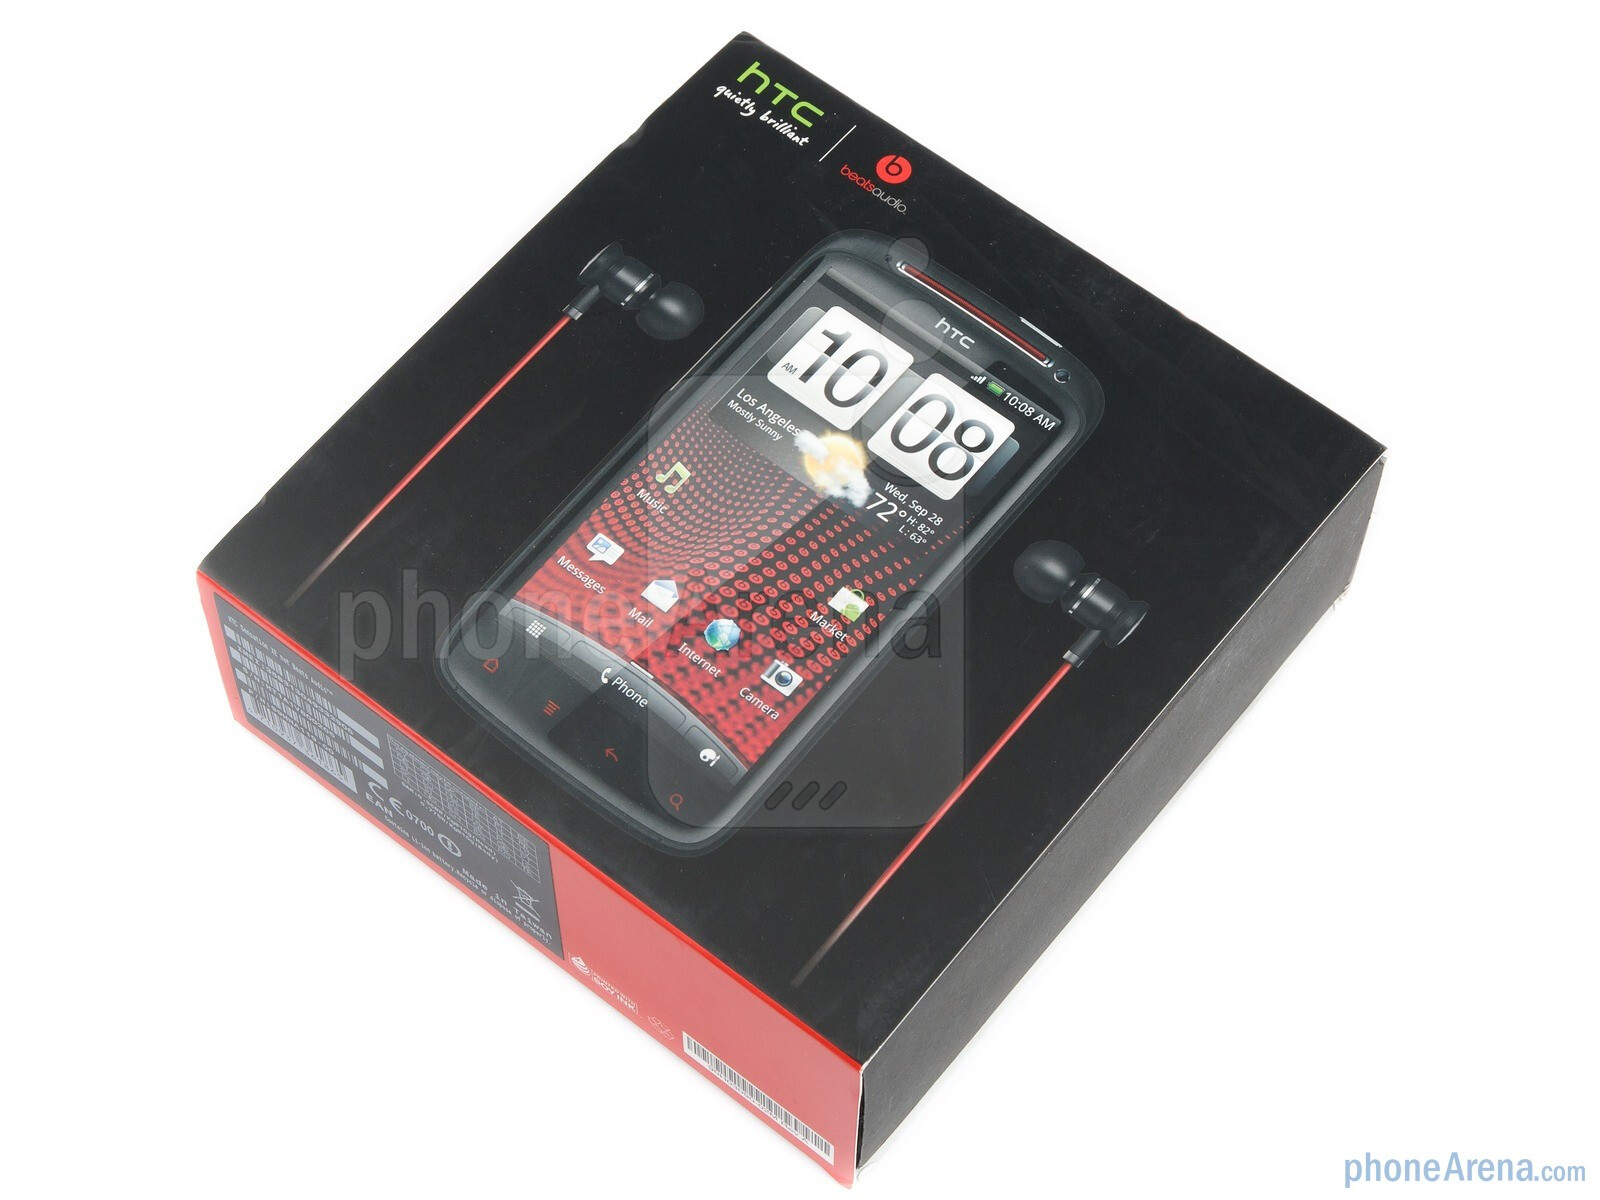 htc sensation xe sim free smartphone (beats audio free )